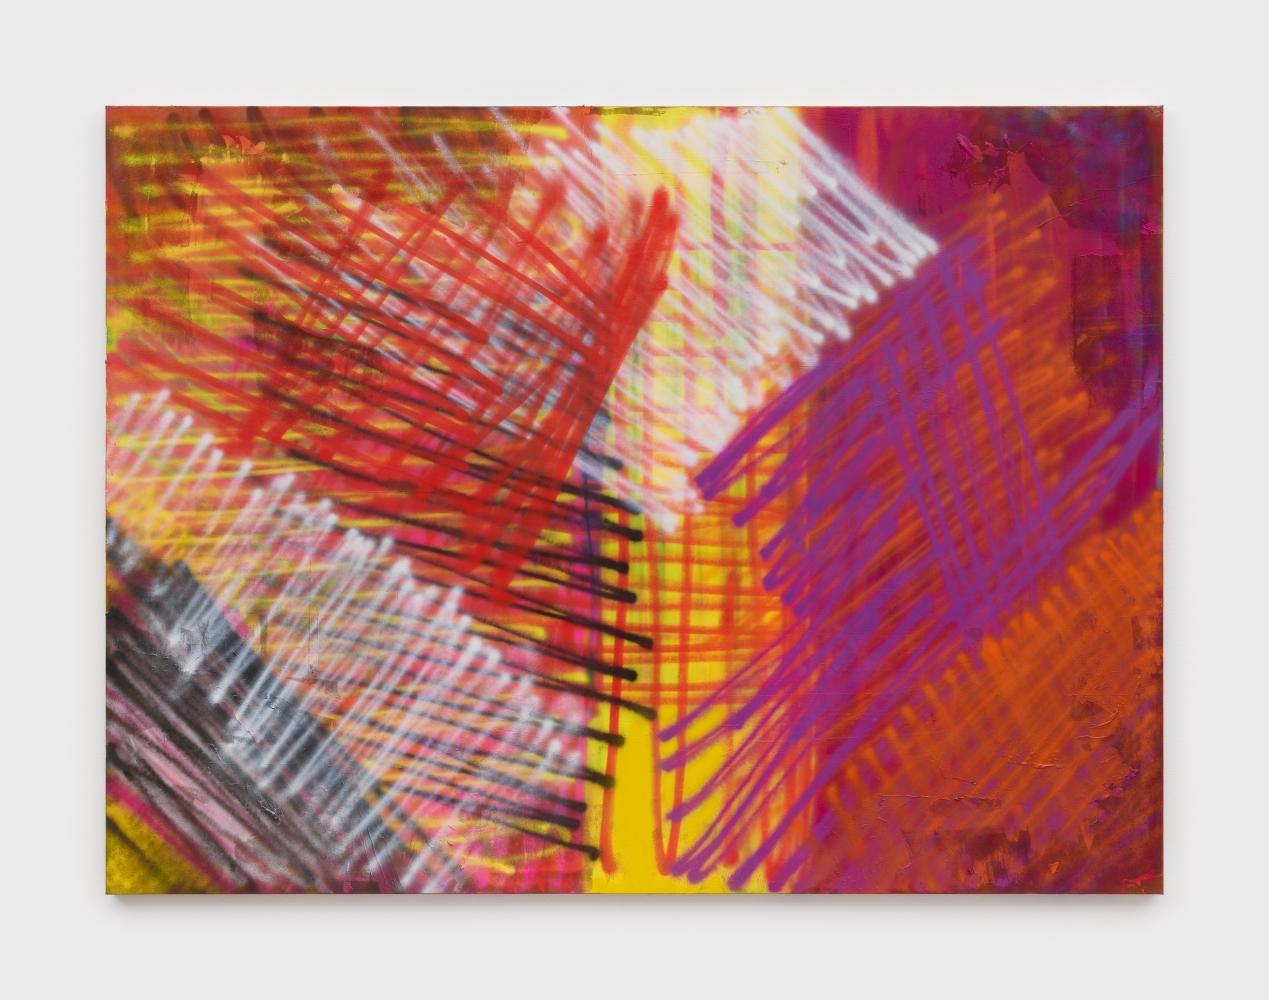 Through the Crest, 2020 Flashe and aerosol spray on canvas 68 x 91 1/2 in (172.7 x 232.4 cm)